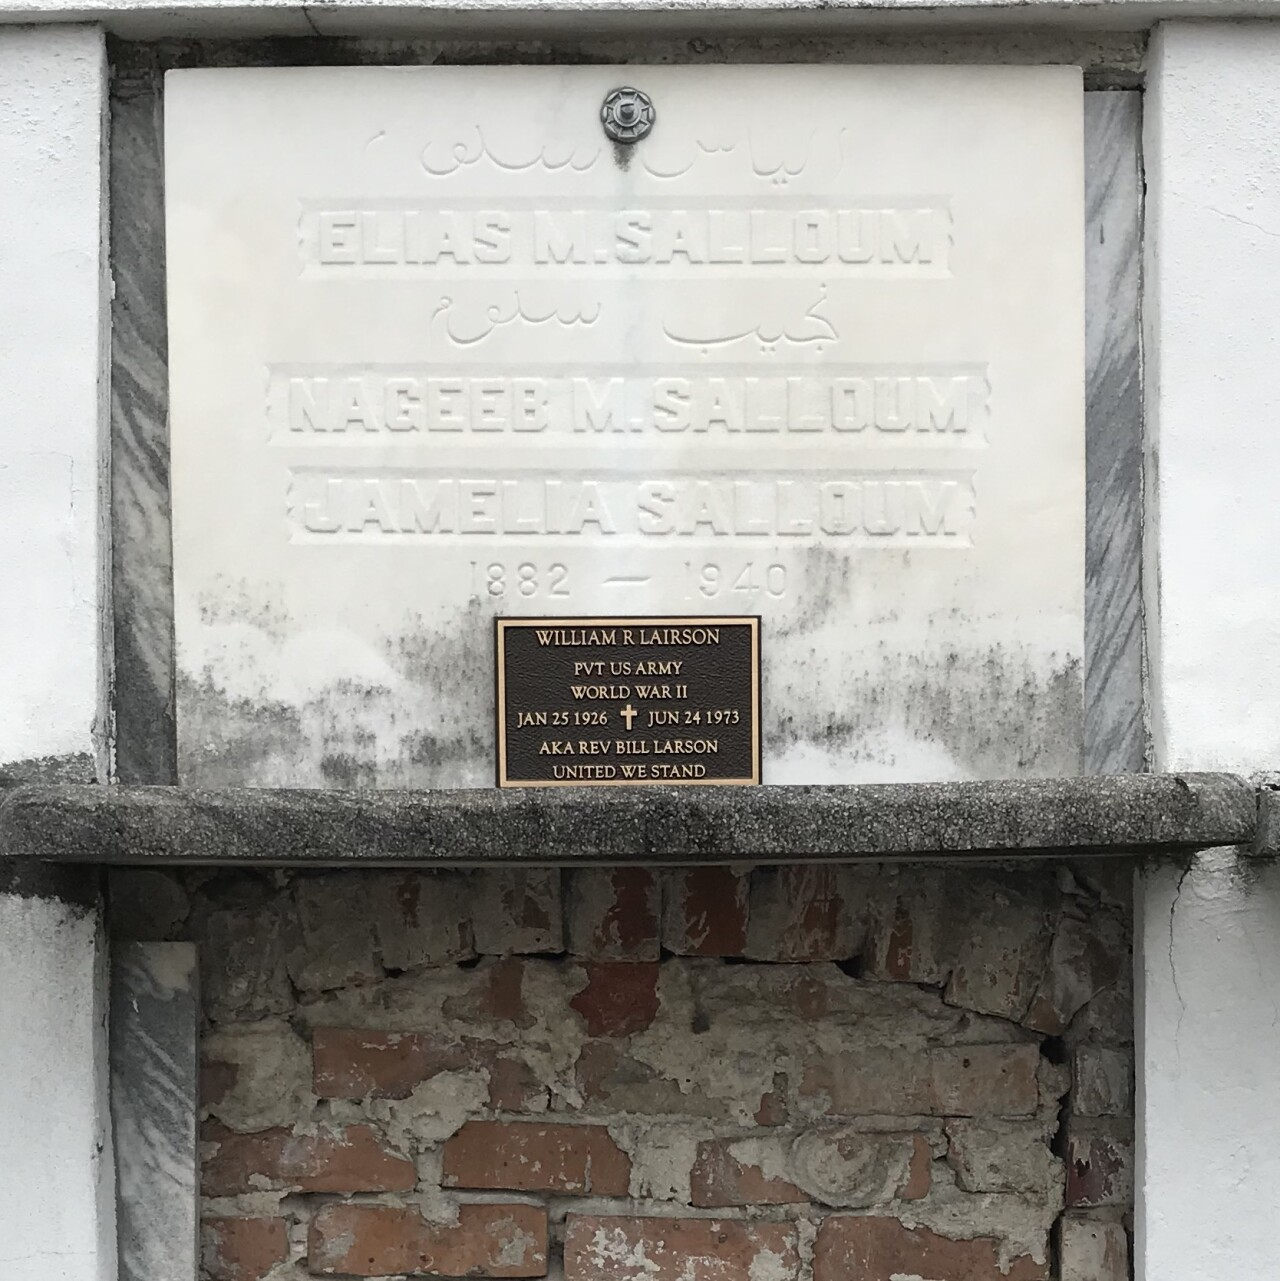 Bill Larson's grave